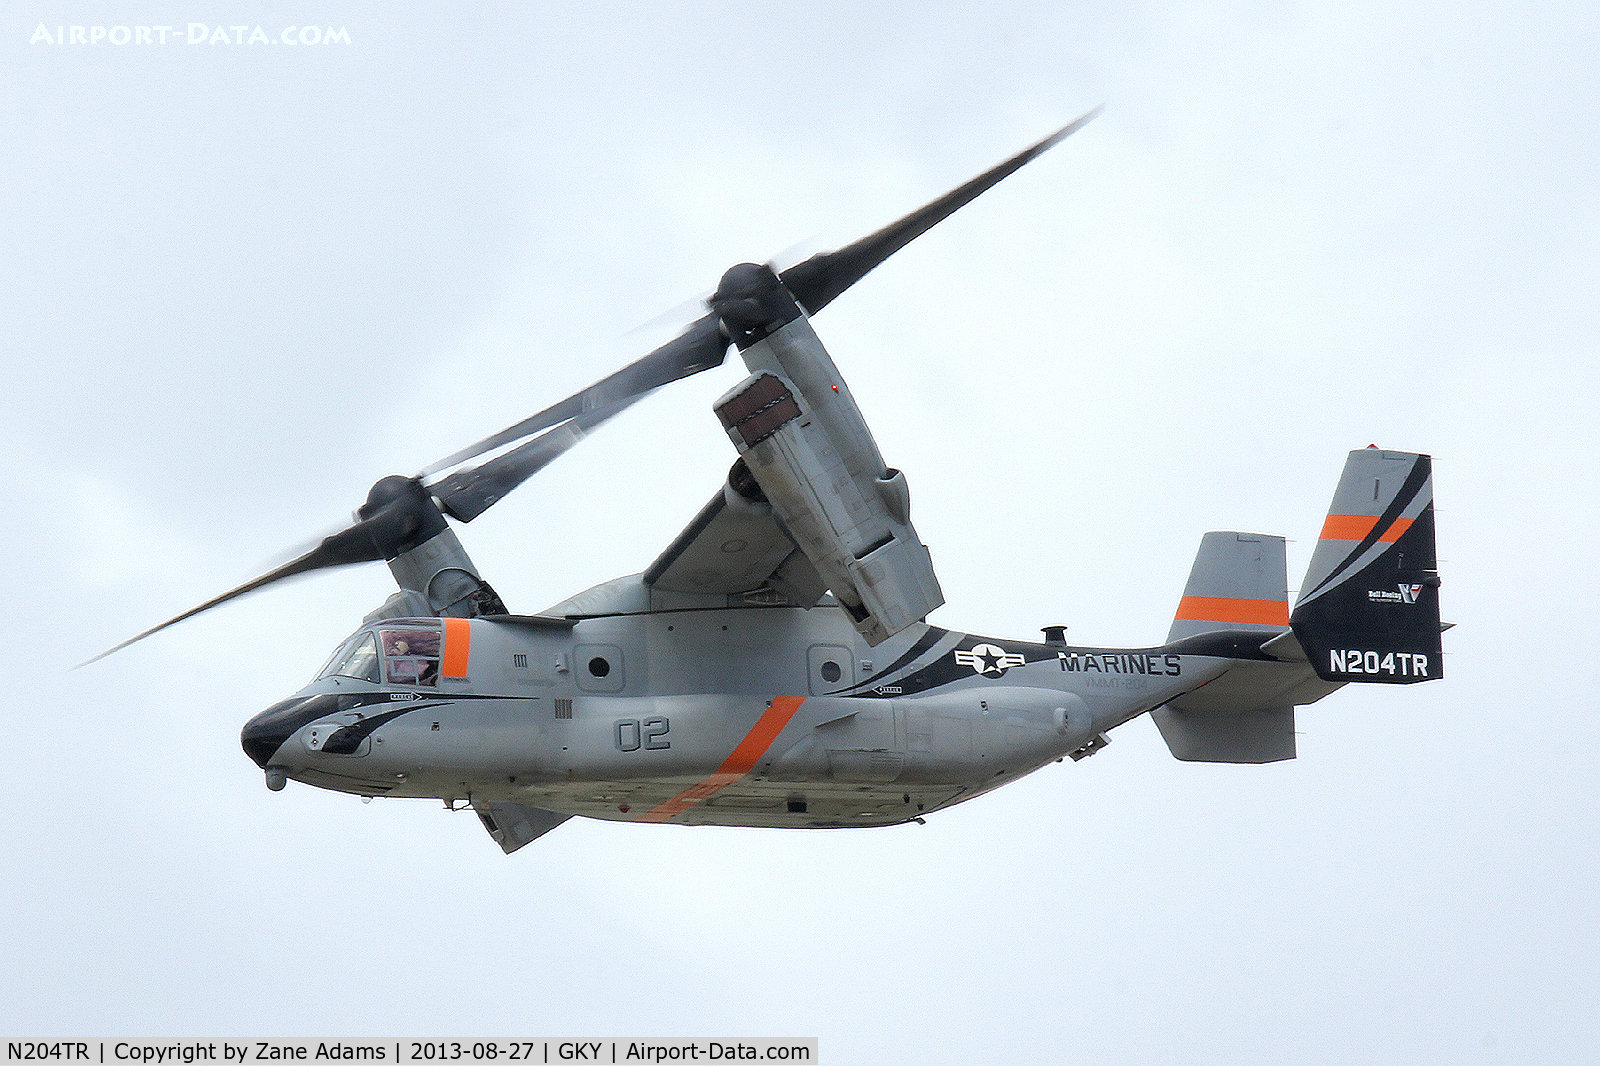 N204TR, Bell-Boeing MV-22B Osprey C/N D0043, MV-22 Osprey at Arlington Municipal - Undergoing intake modification and aerial refueling testing for the USMC